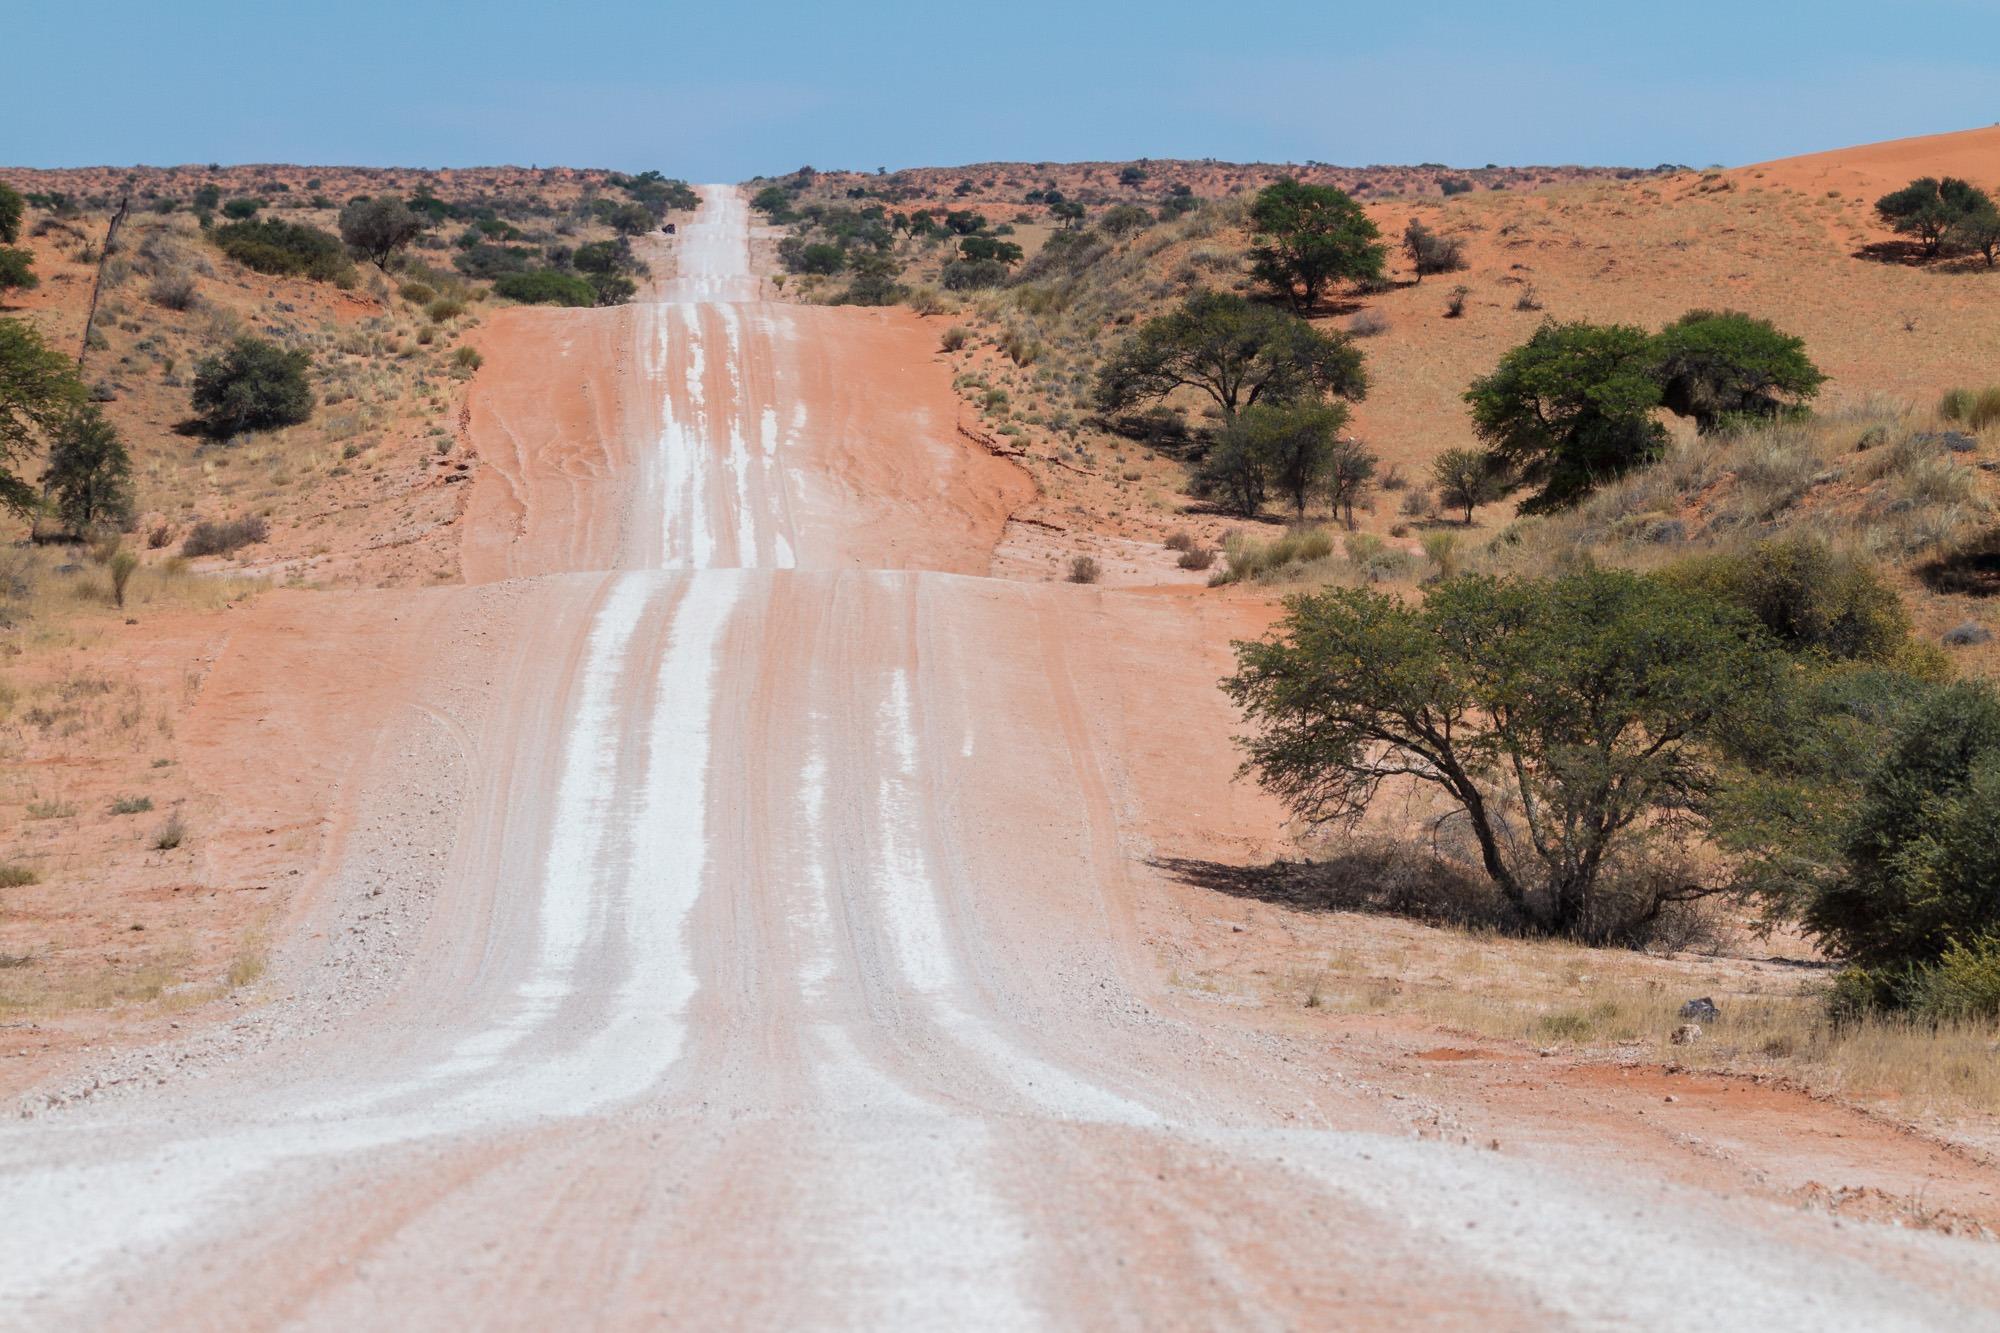 Lange gerade Strasse durch rote Sanddünen in der Kalahari in Namibia